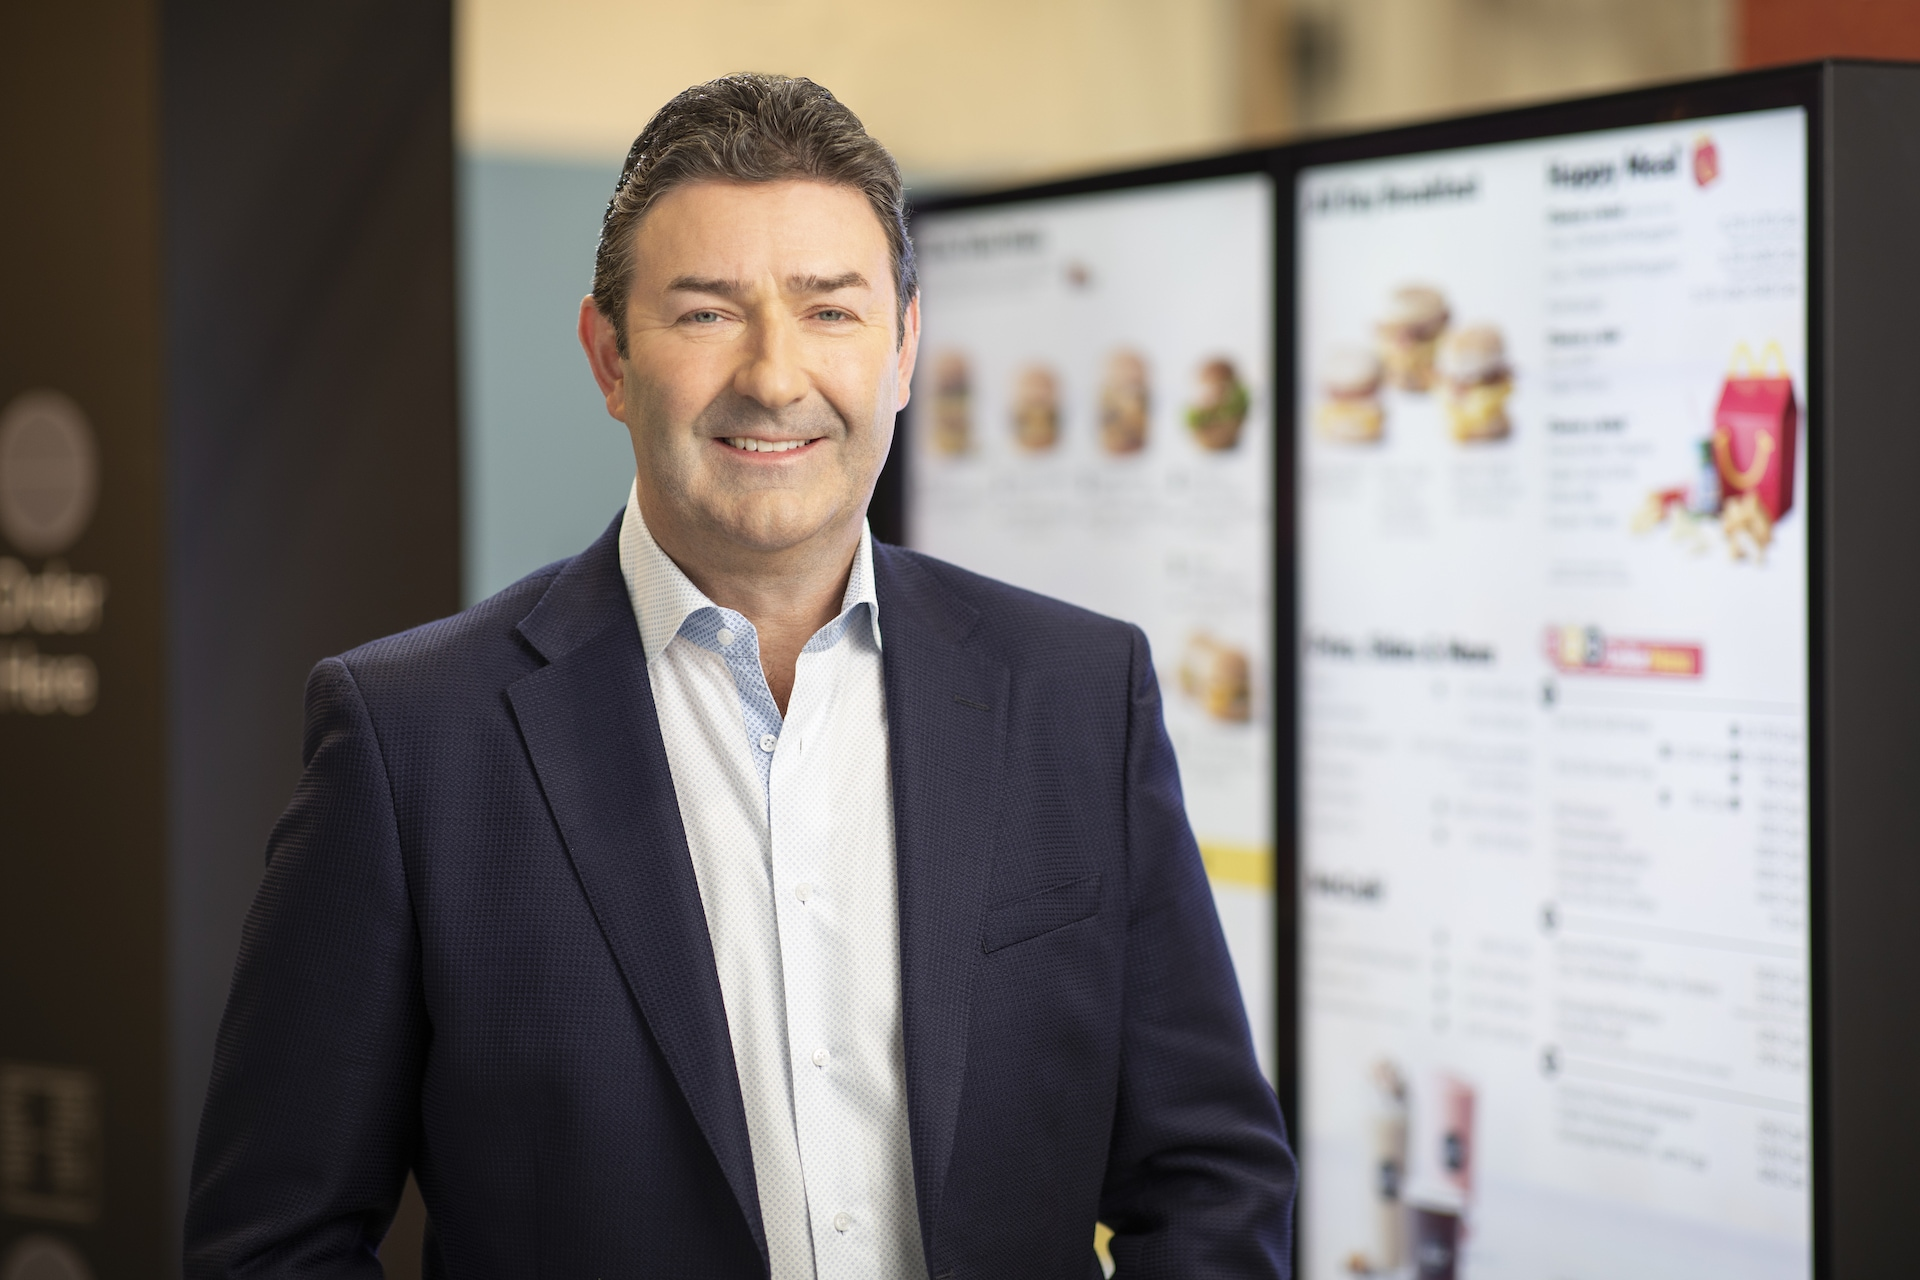 Steve Easterbrook, CEO McDonald's